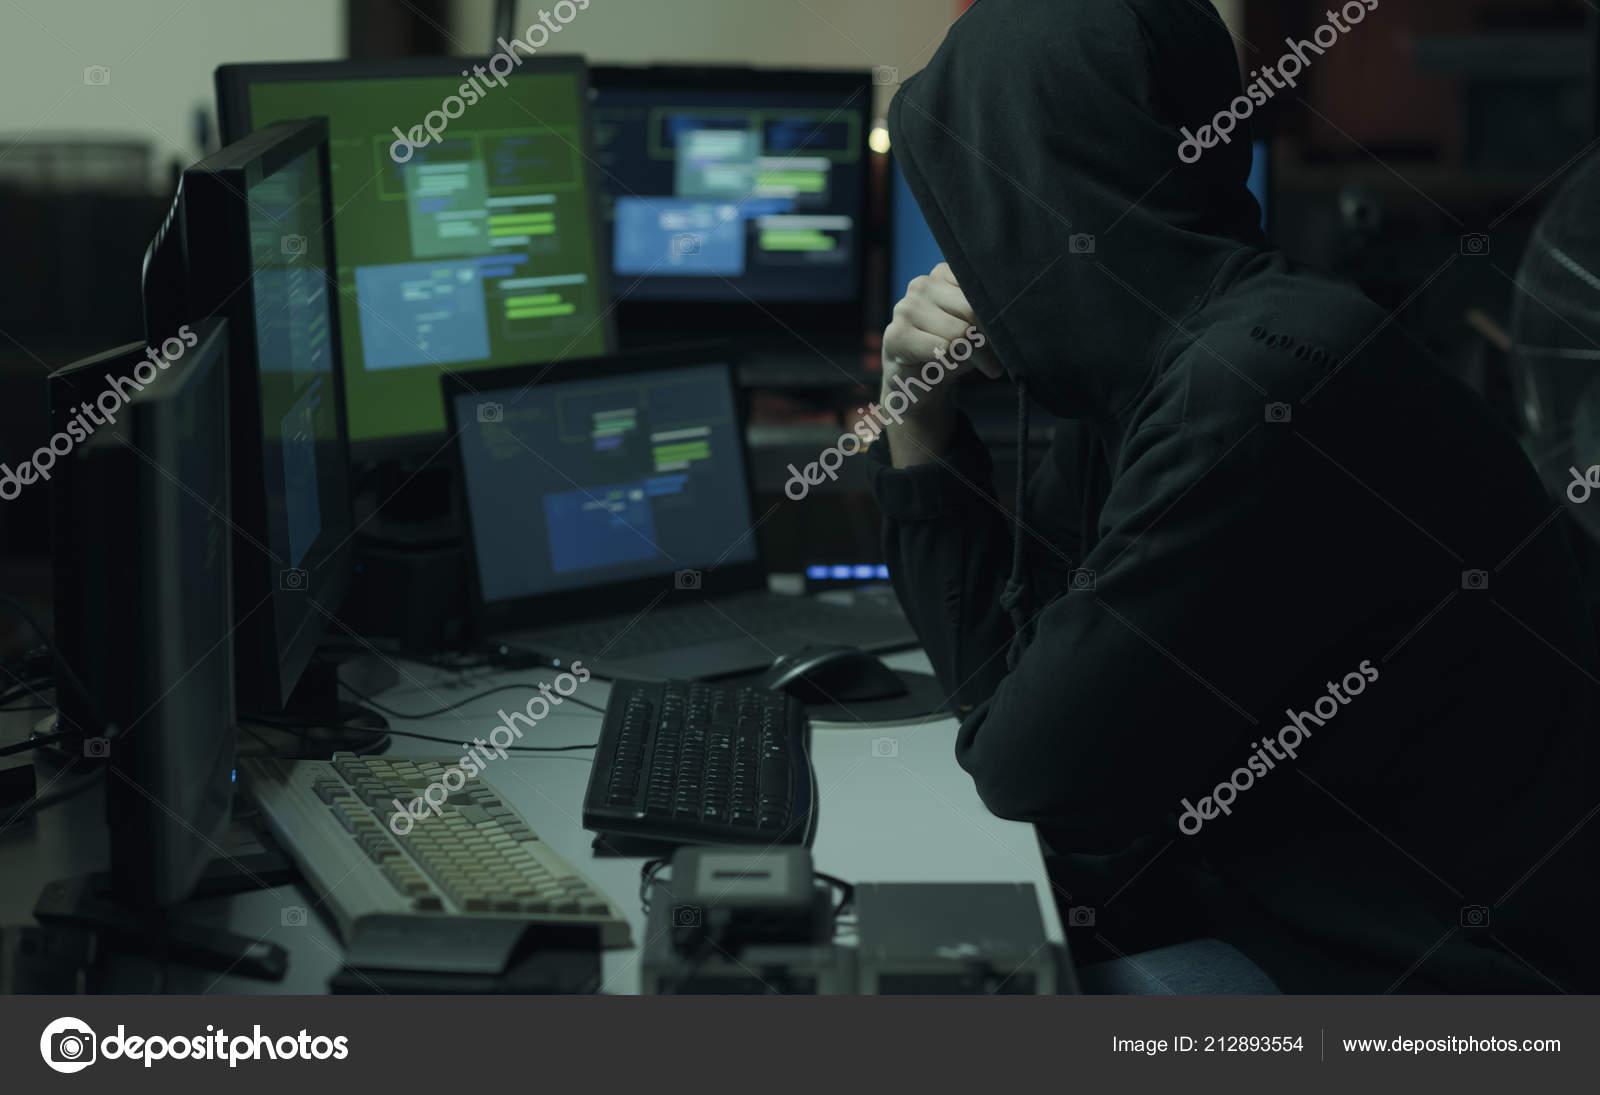 f8e3f55676 Δροσερό Νεαρή Χάκερ Κουκούλα Που Λειτουργεί Υπολογιστές Εγκληματικότητα  Στον Κυβερνοχώρο — Φωτογραφία Αρχείου